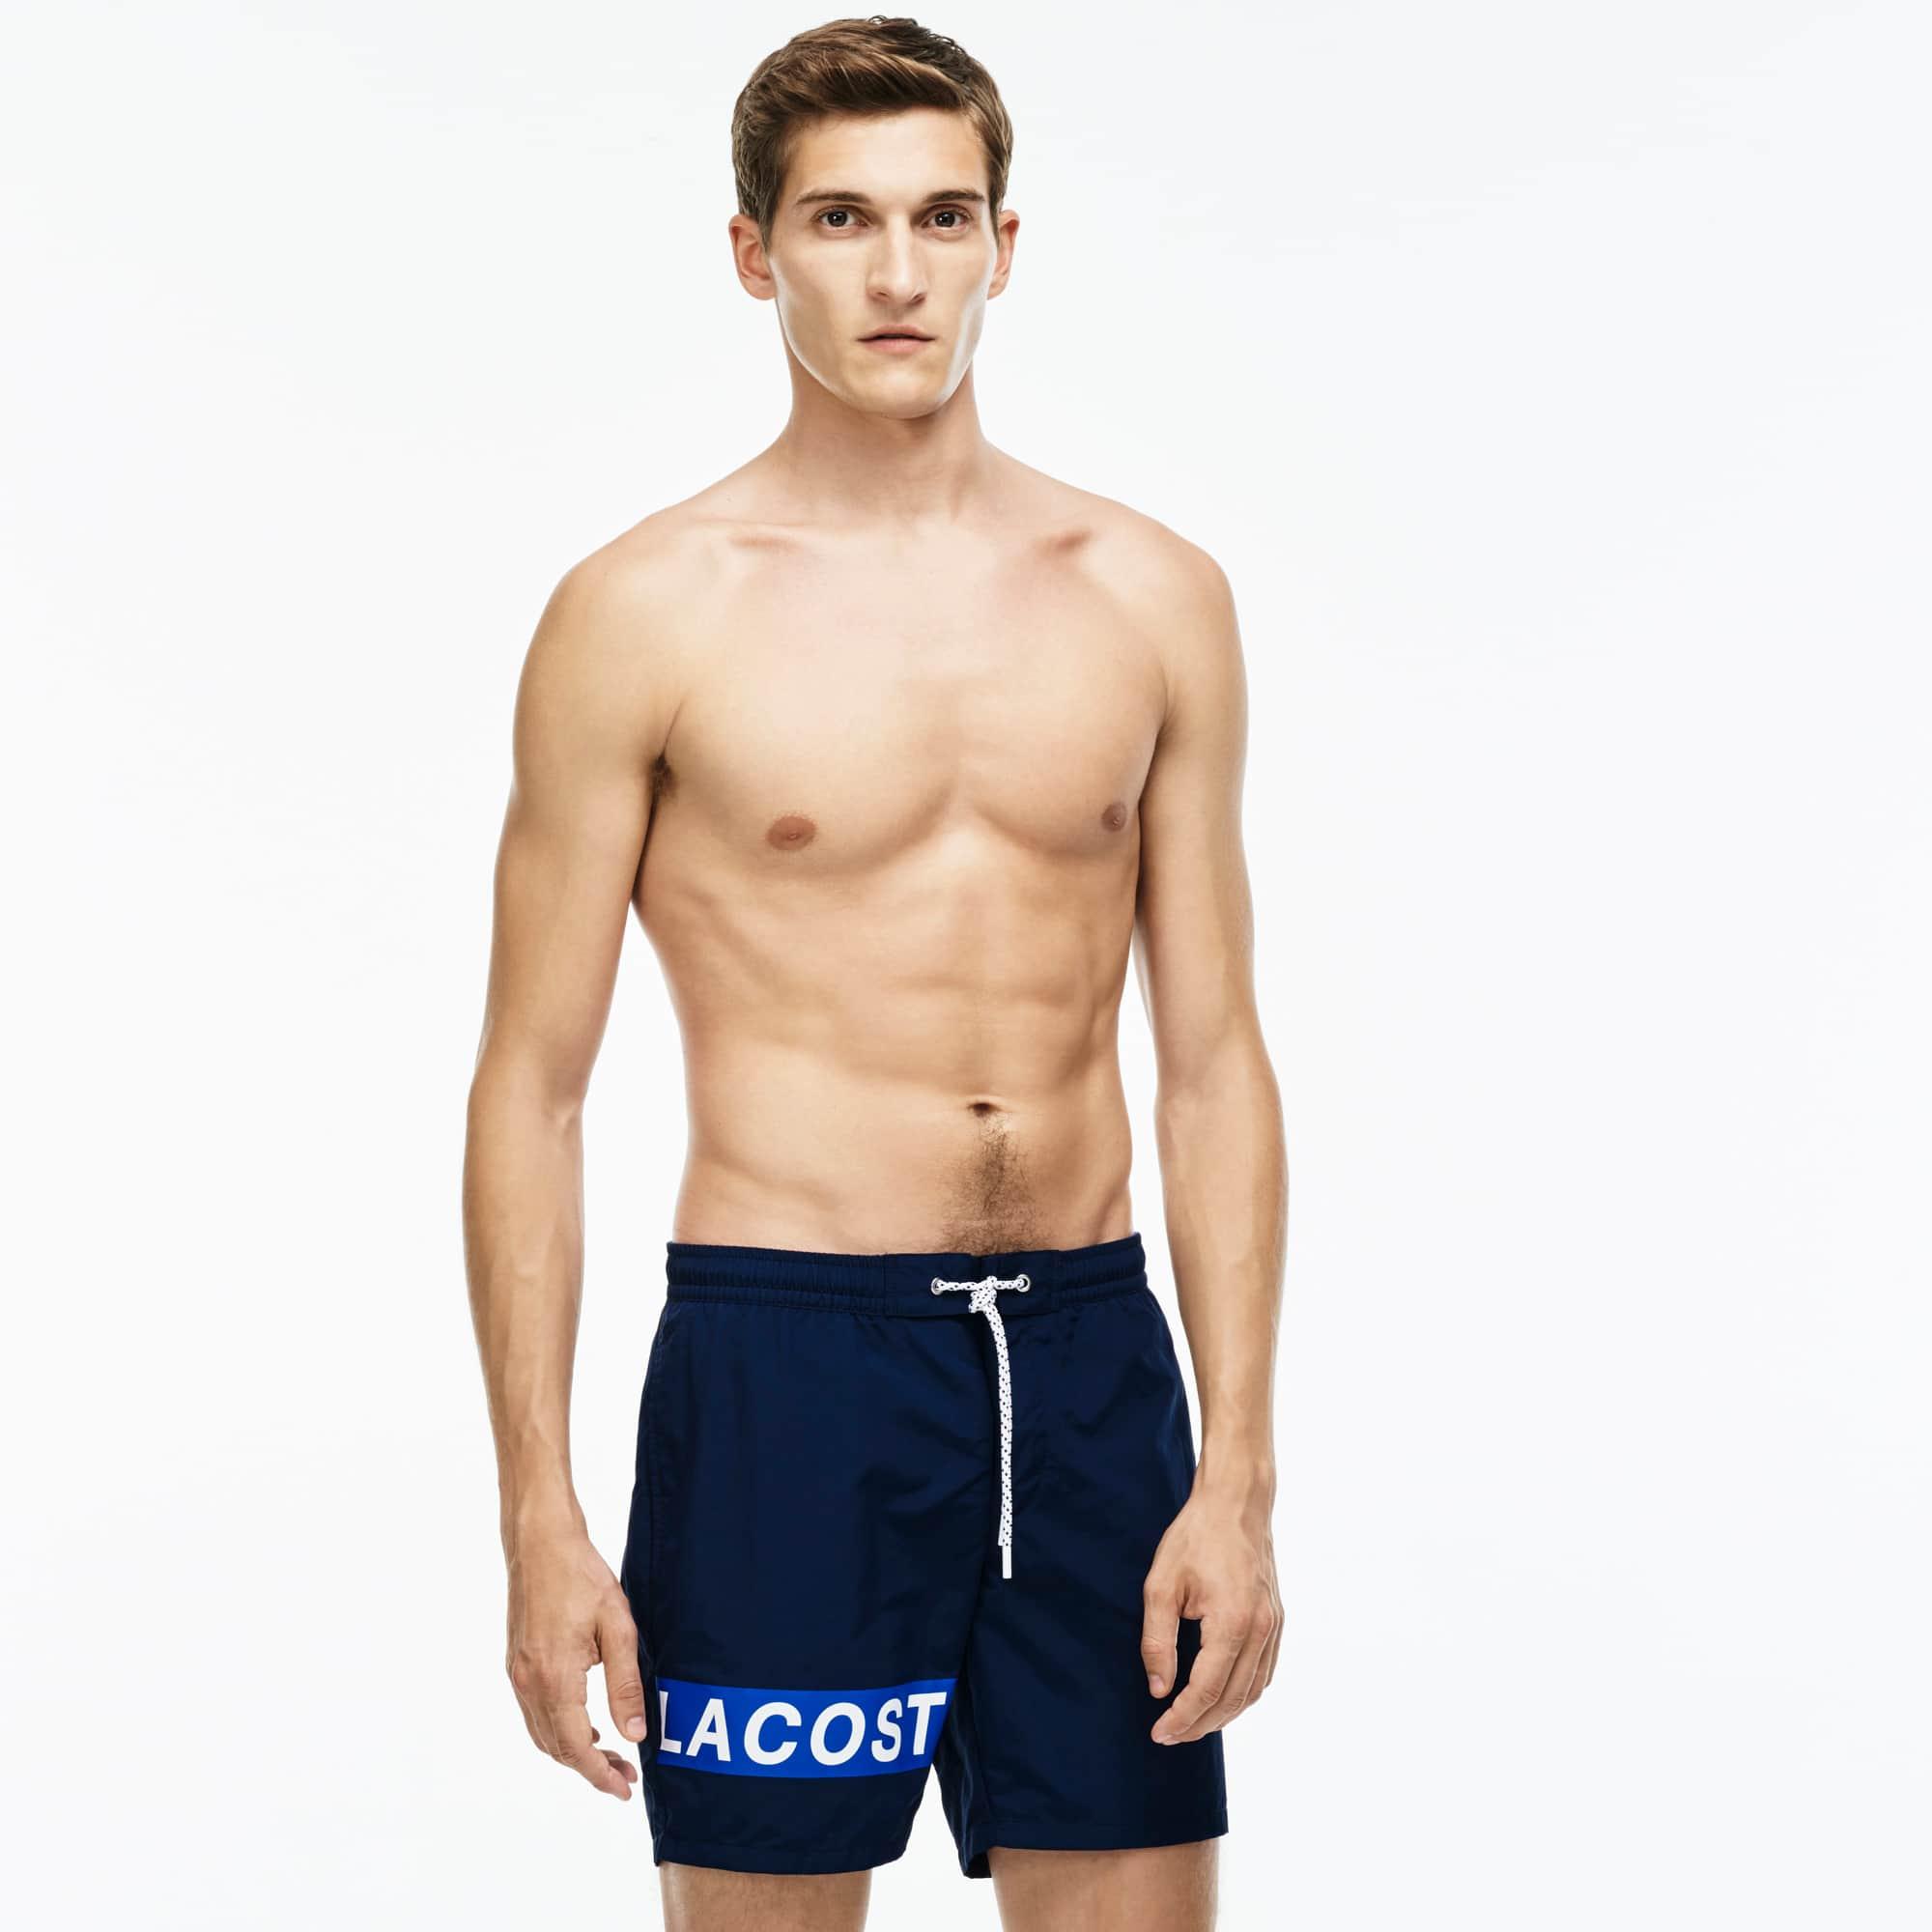 Men's Medium Cut Branded Swimming Trunks